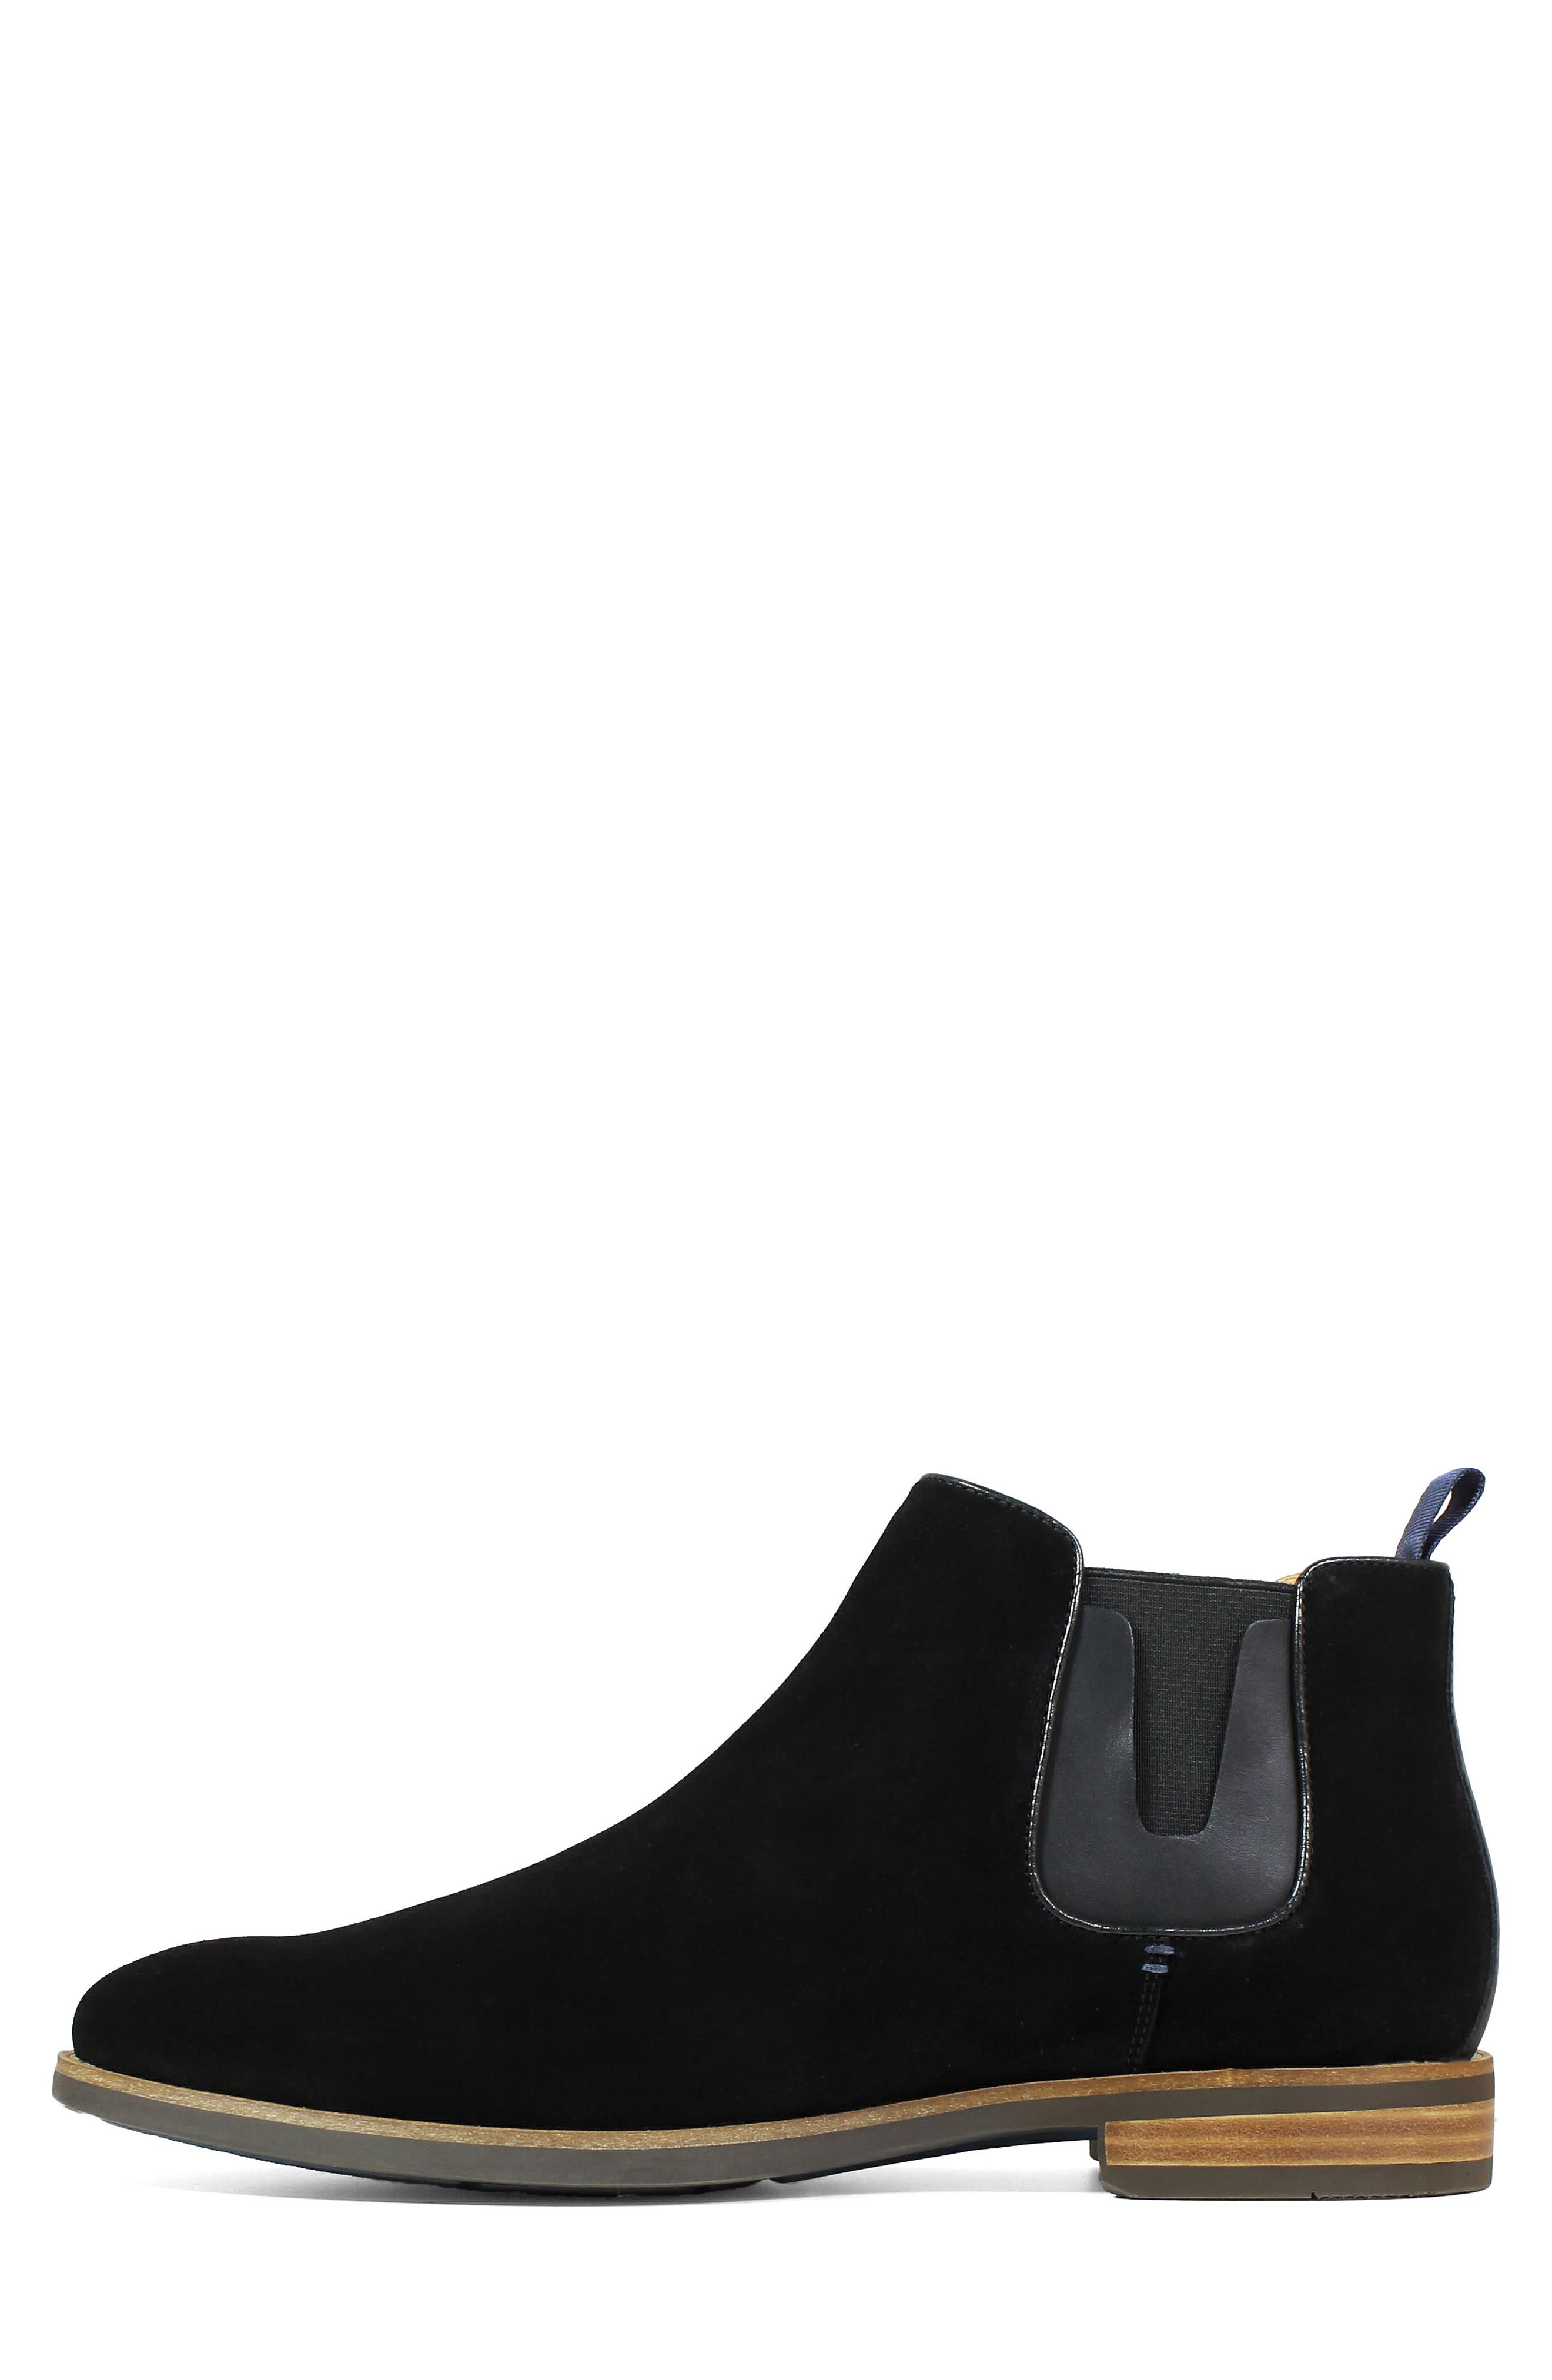 Uptown Plain Toe Mid Chelsea Boot,                             Alternate thumbnail 8, color,                             BLACK SUEDE